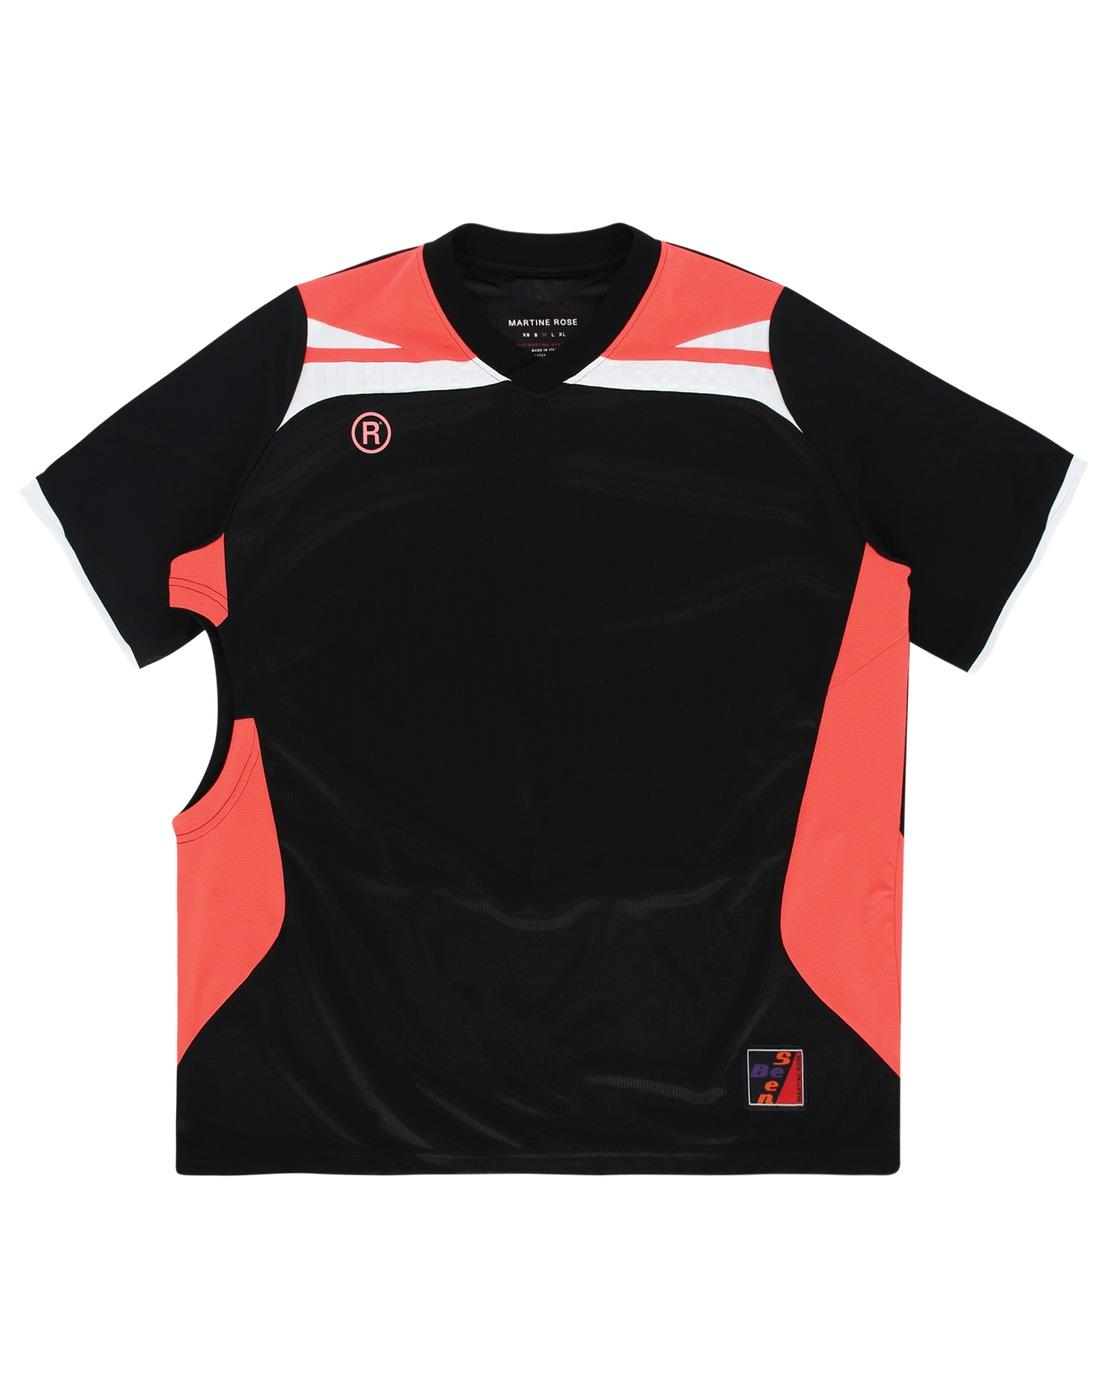 Martine Rose Two Way Football Top Black/Pink